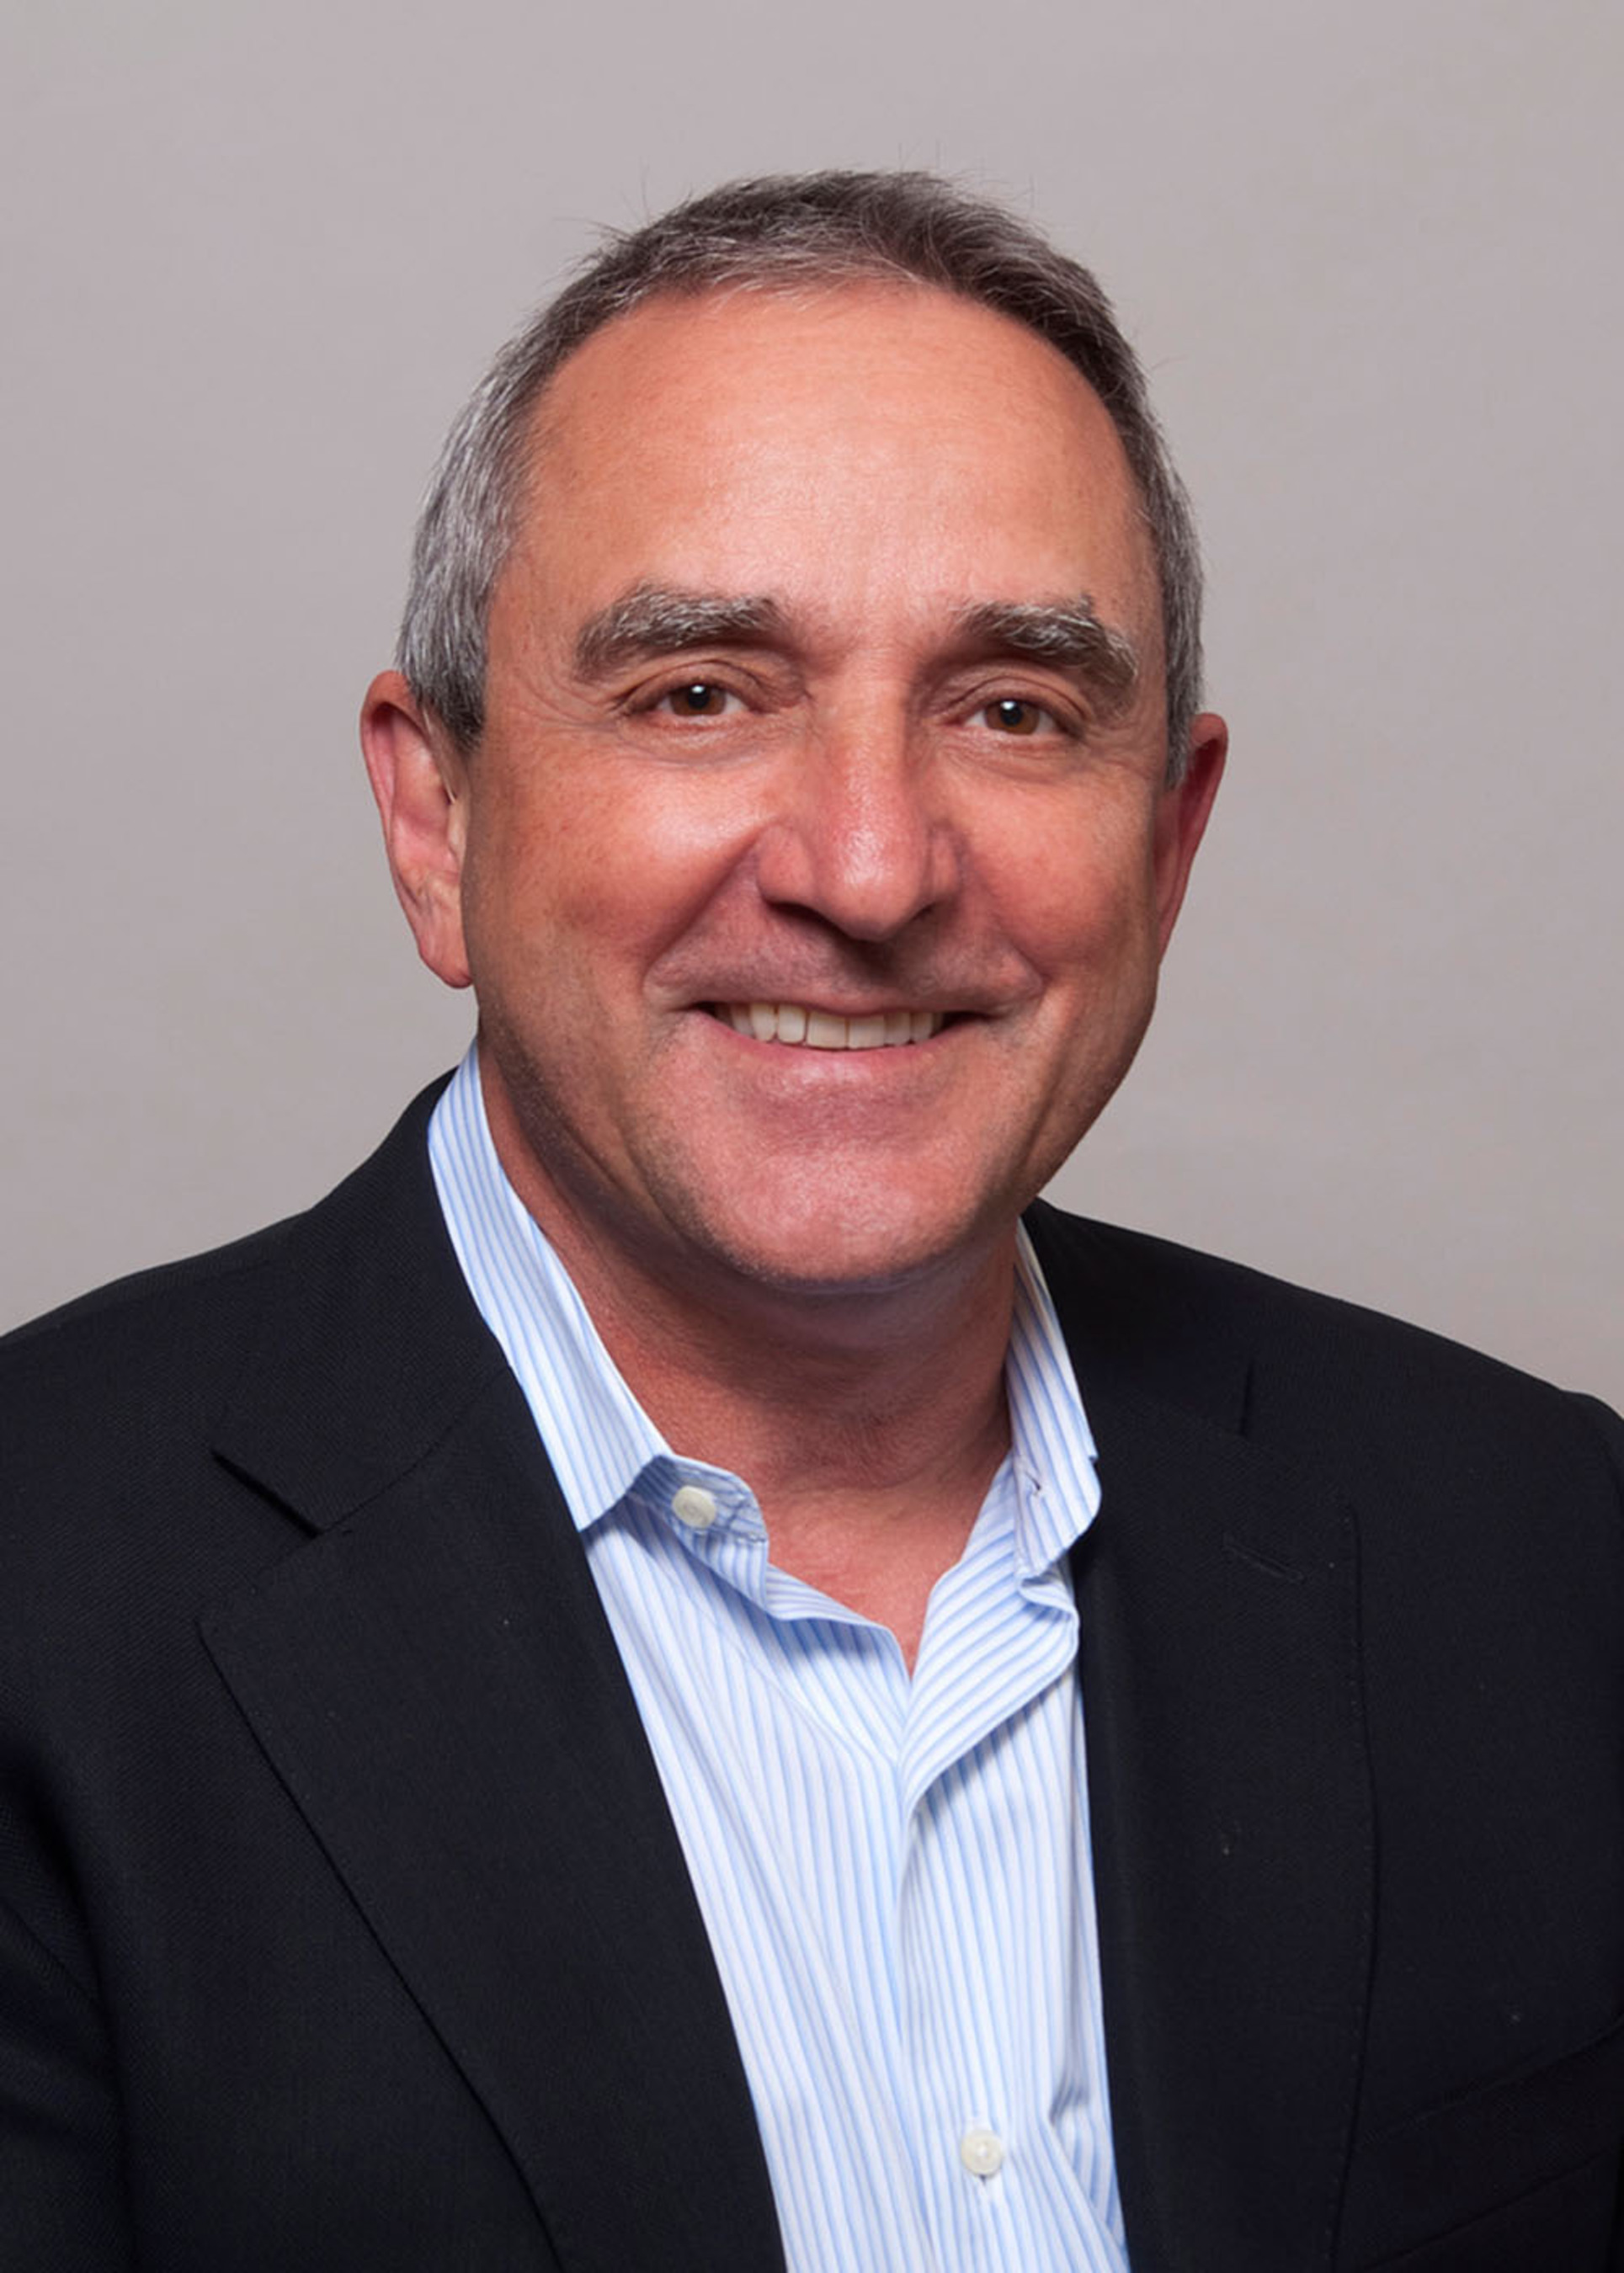 Stu Schmidt, President - Zend Technologies. (PRNewsFoto/Zend Technologies) (PRNewsFoto/ZEND TECHNOLOGIES)